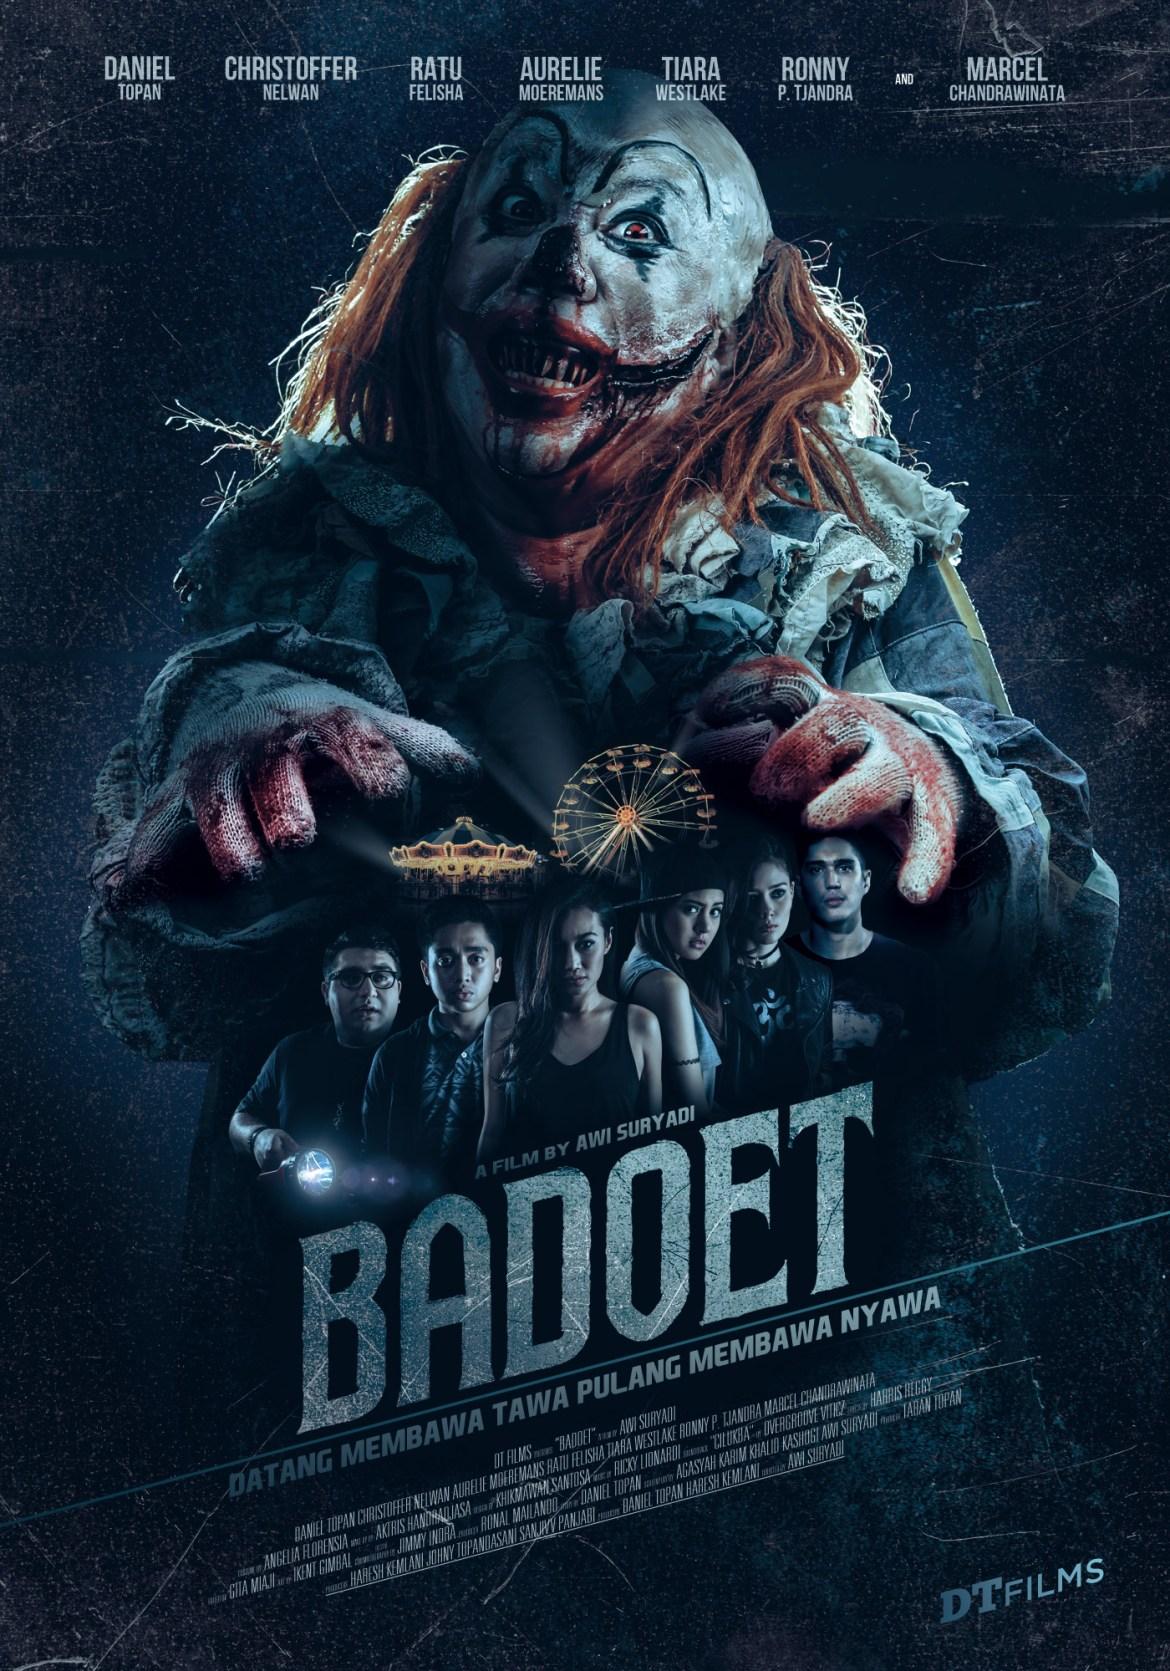 Poster-Badoet-Digital-2